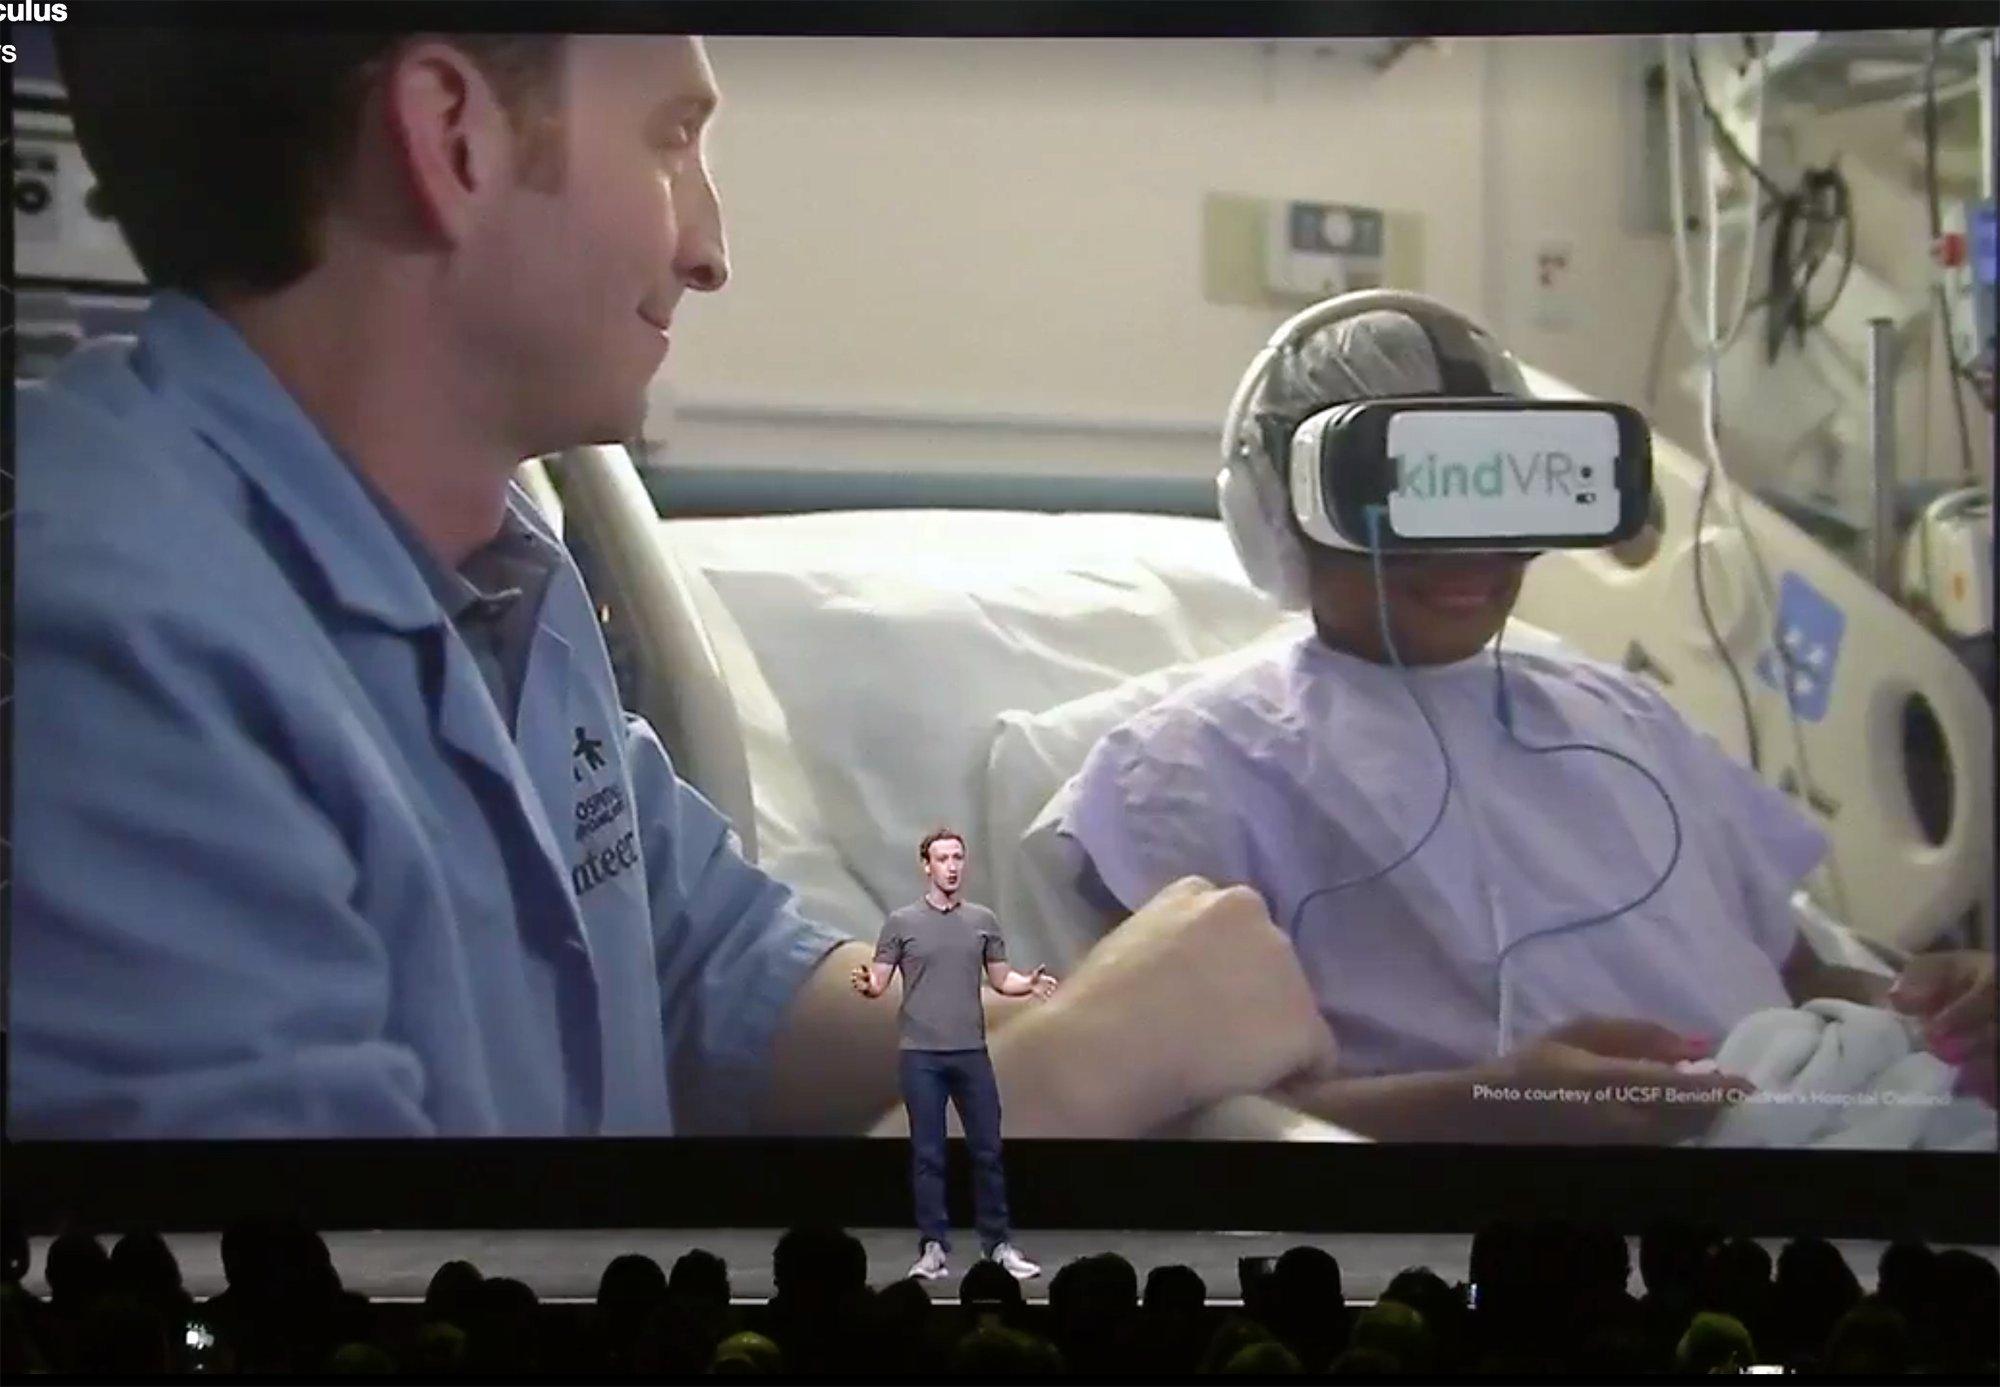 KindVR-Zuckerberg-Oculus.jpg